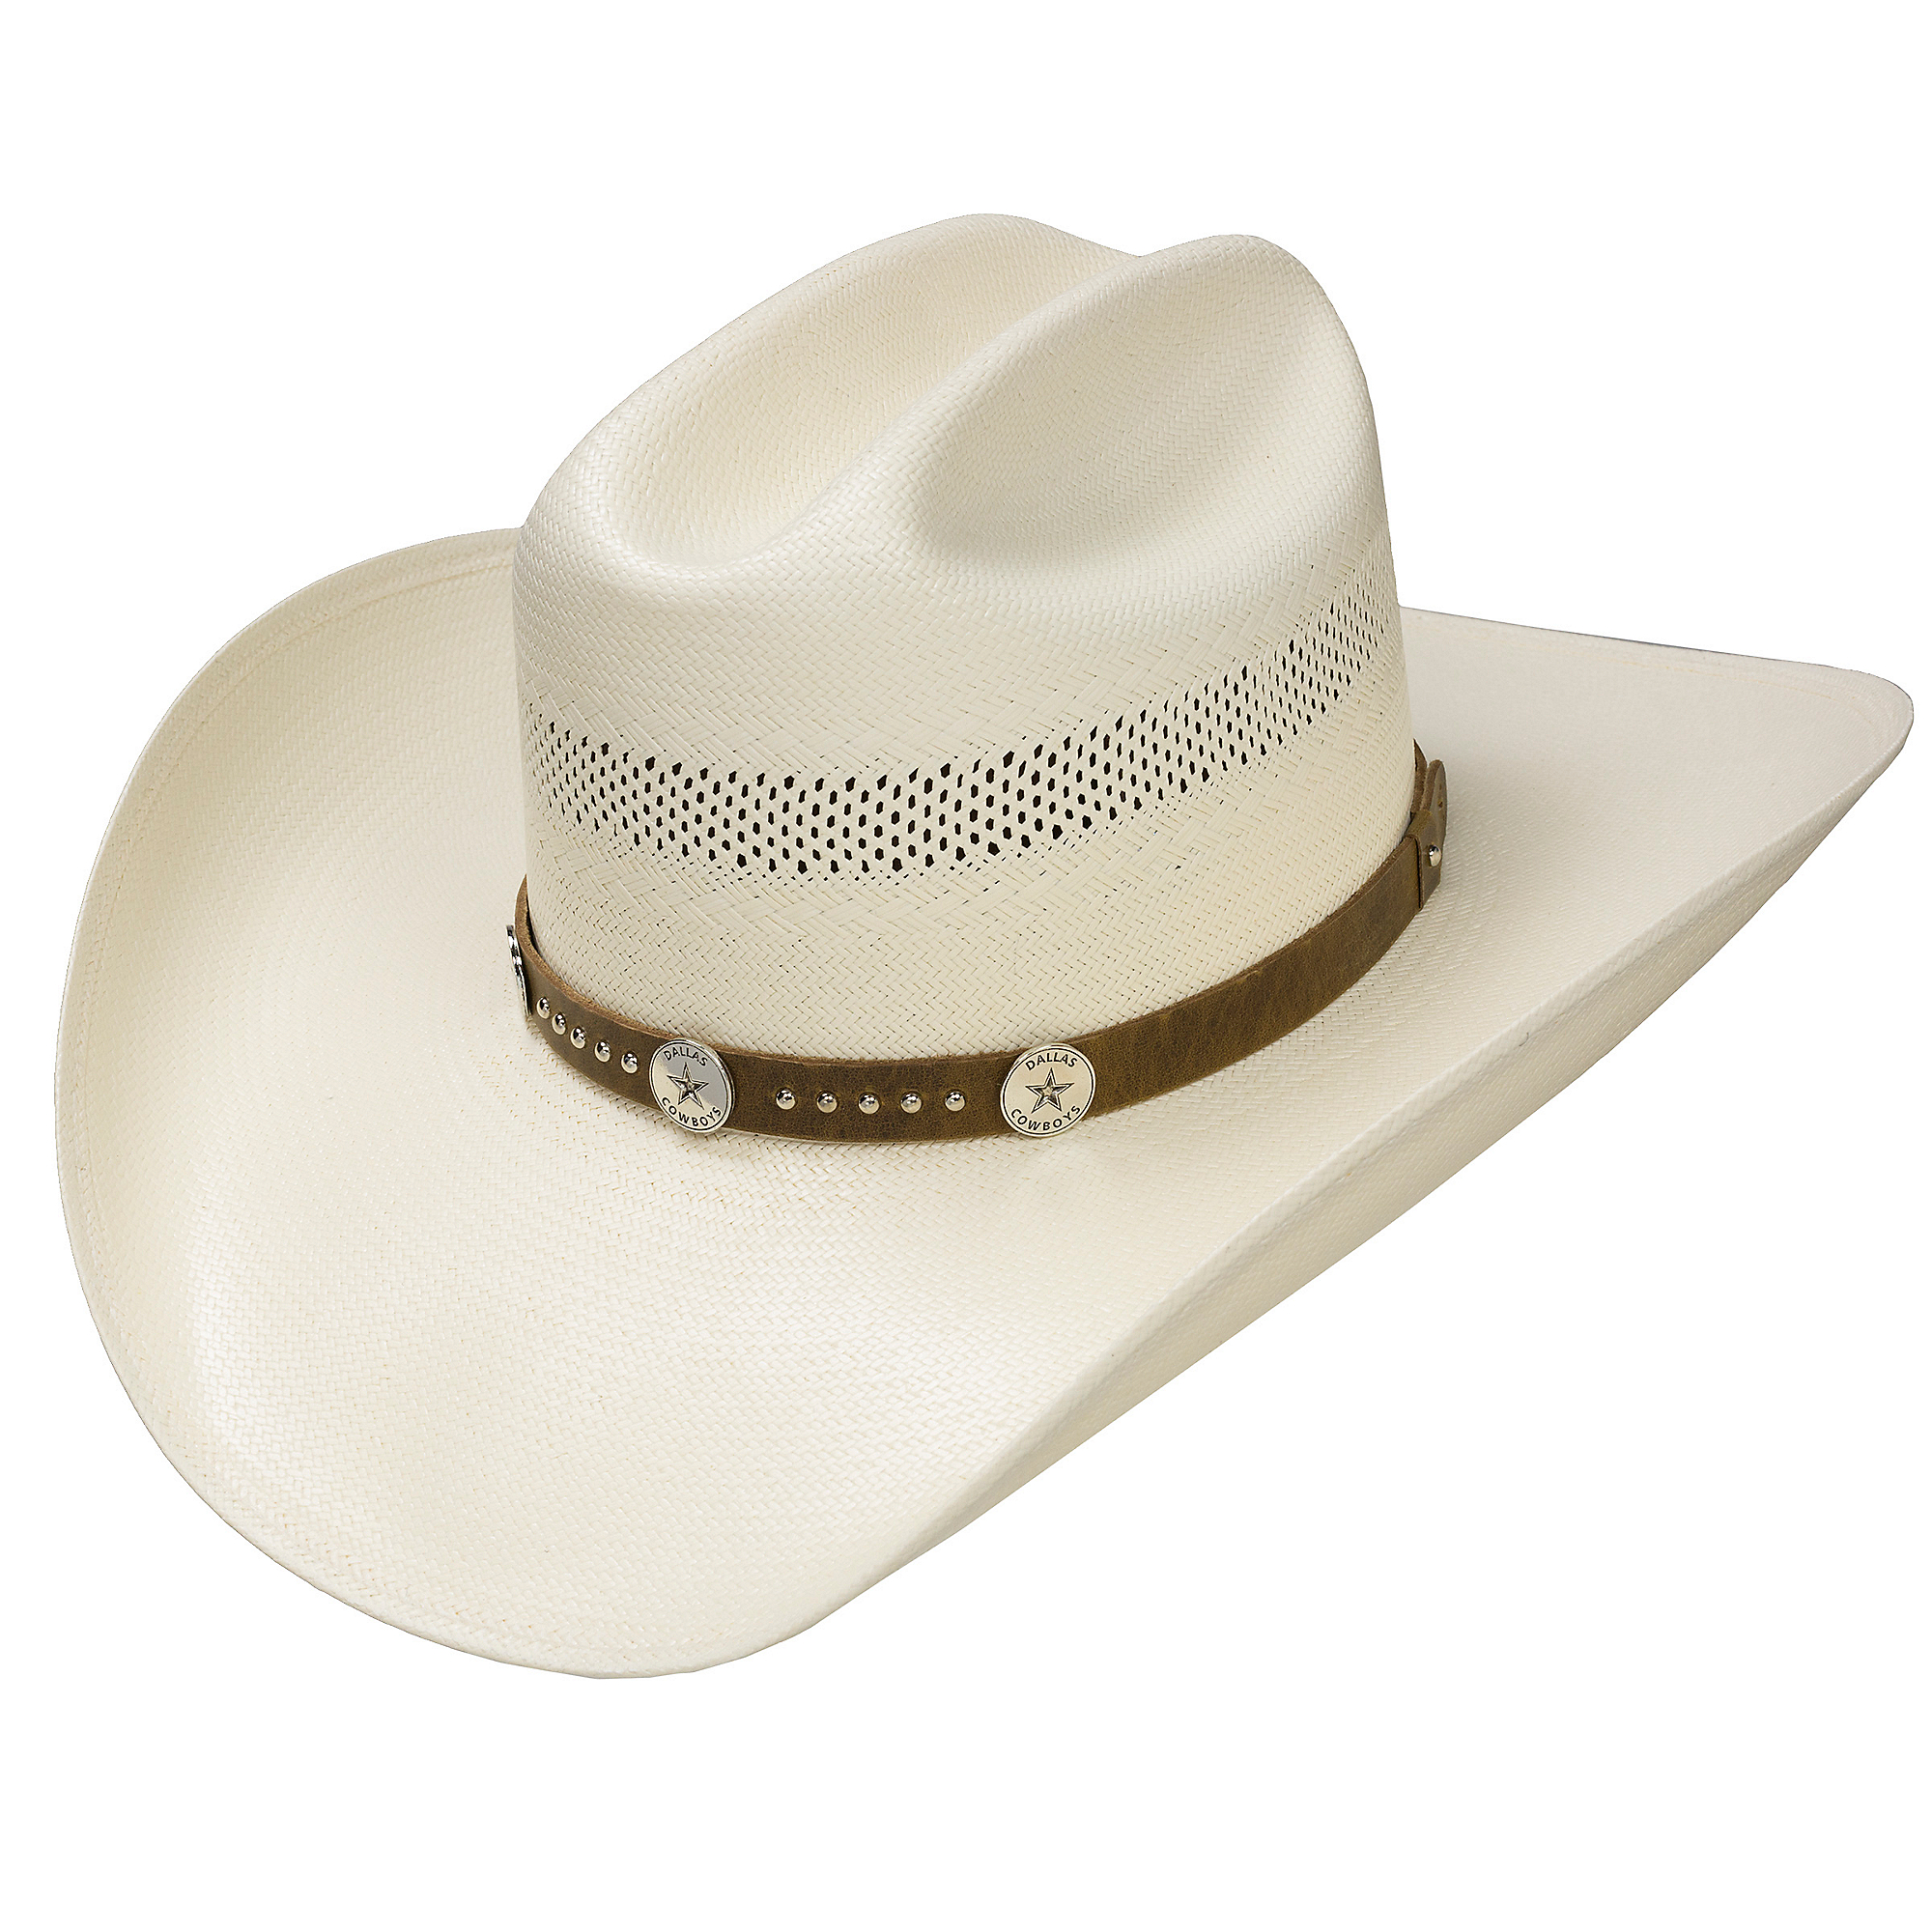 3c961dbacfe18f Dallas Cowboys Stetson Trail Rider Cowboy Hat | Dallas Cowboys Pro Shop